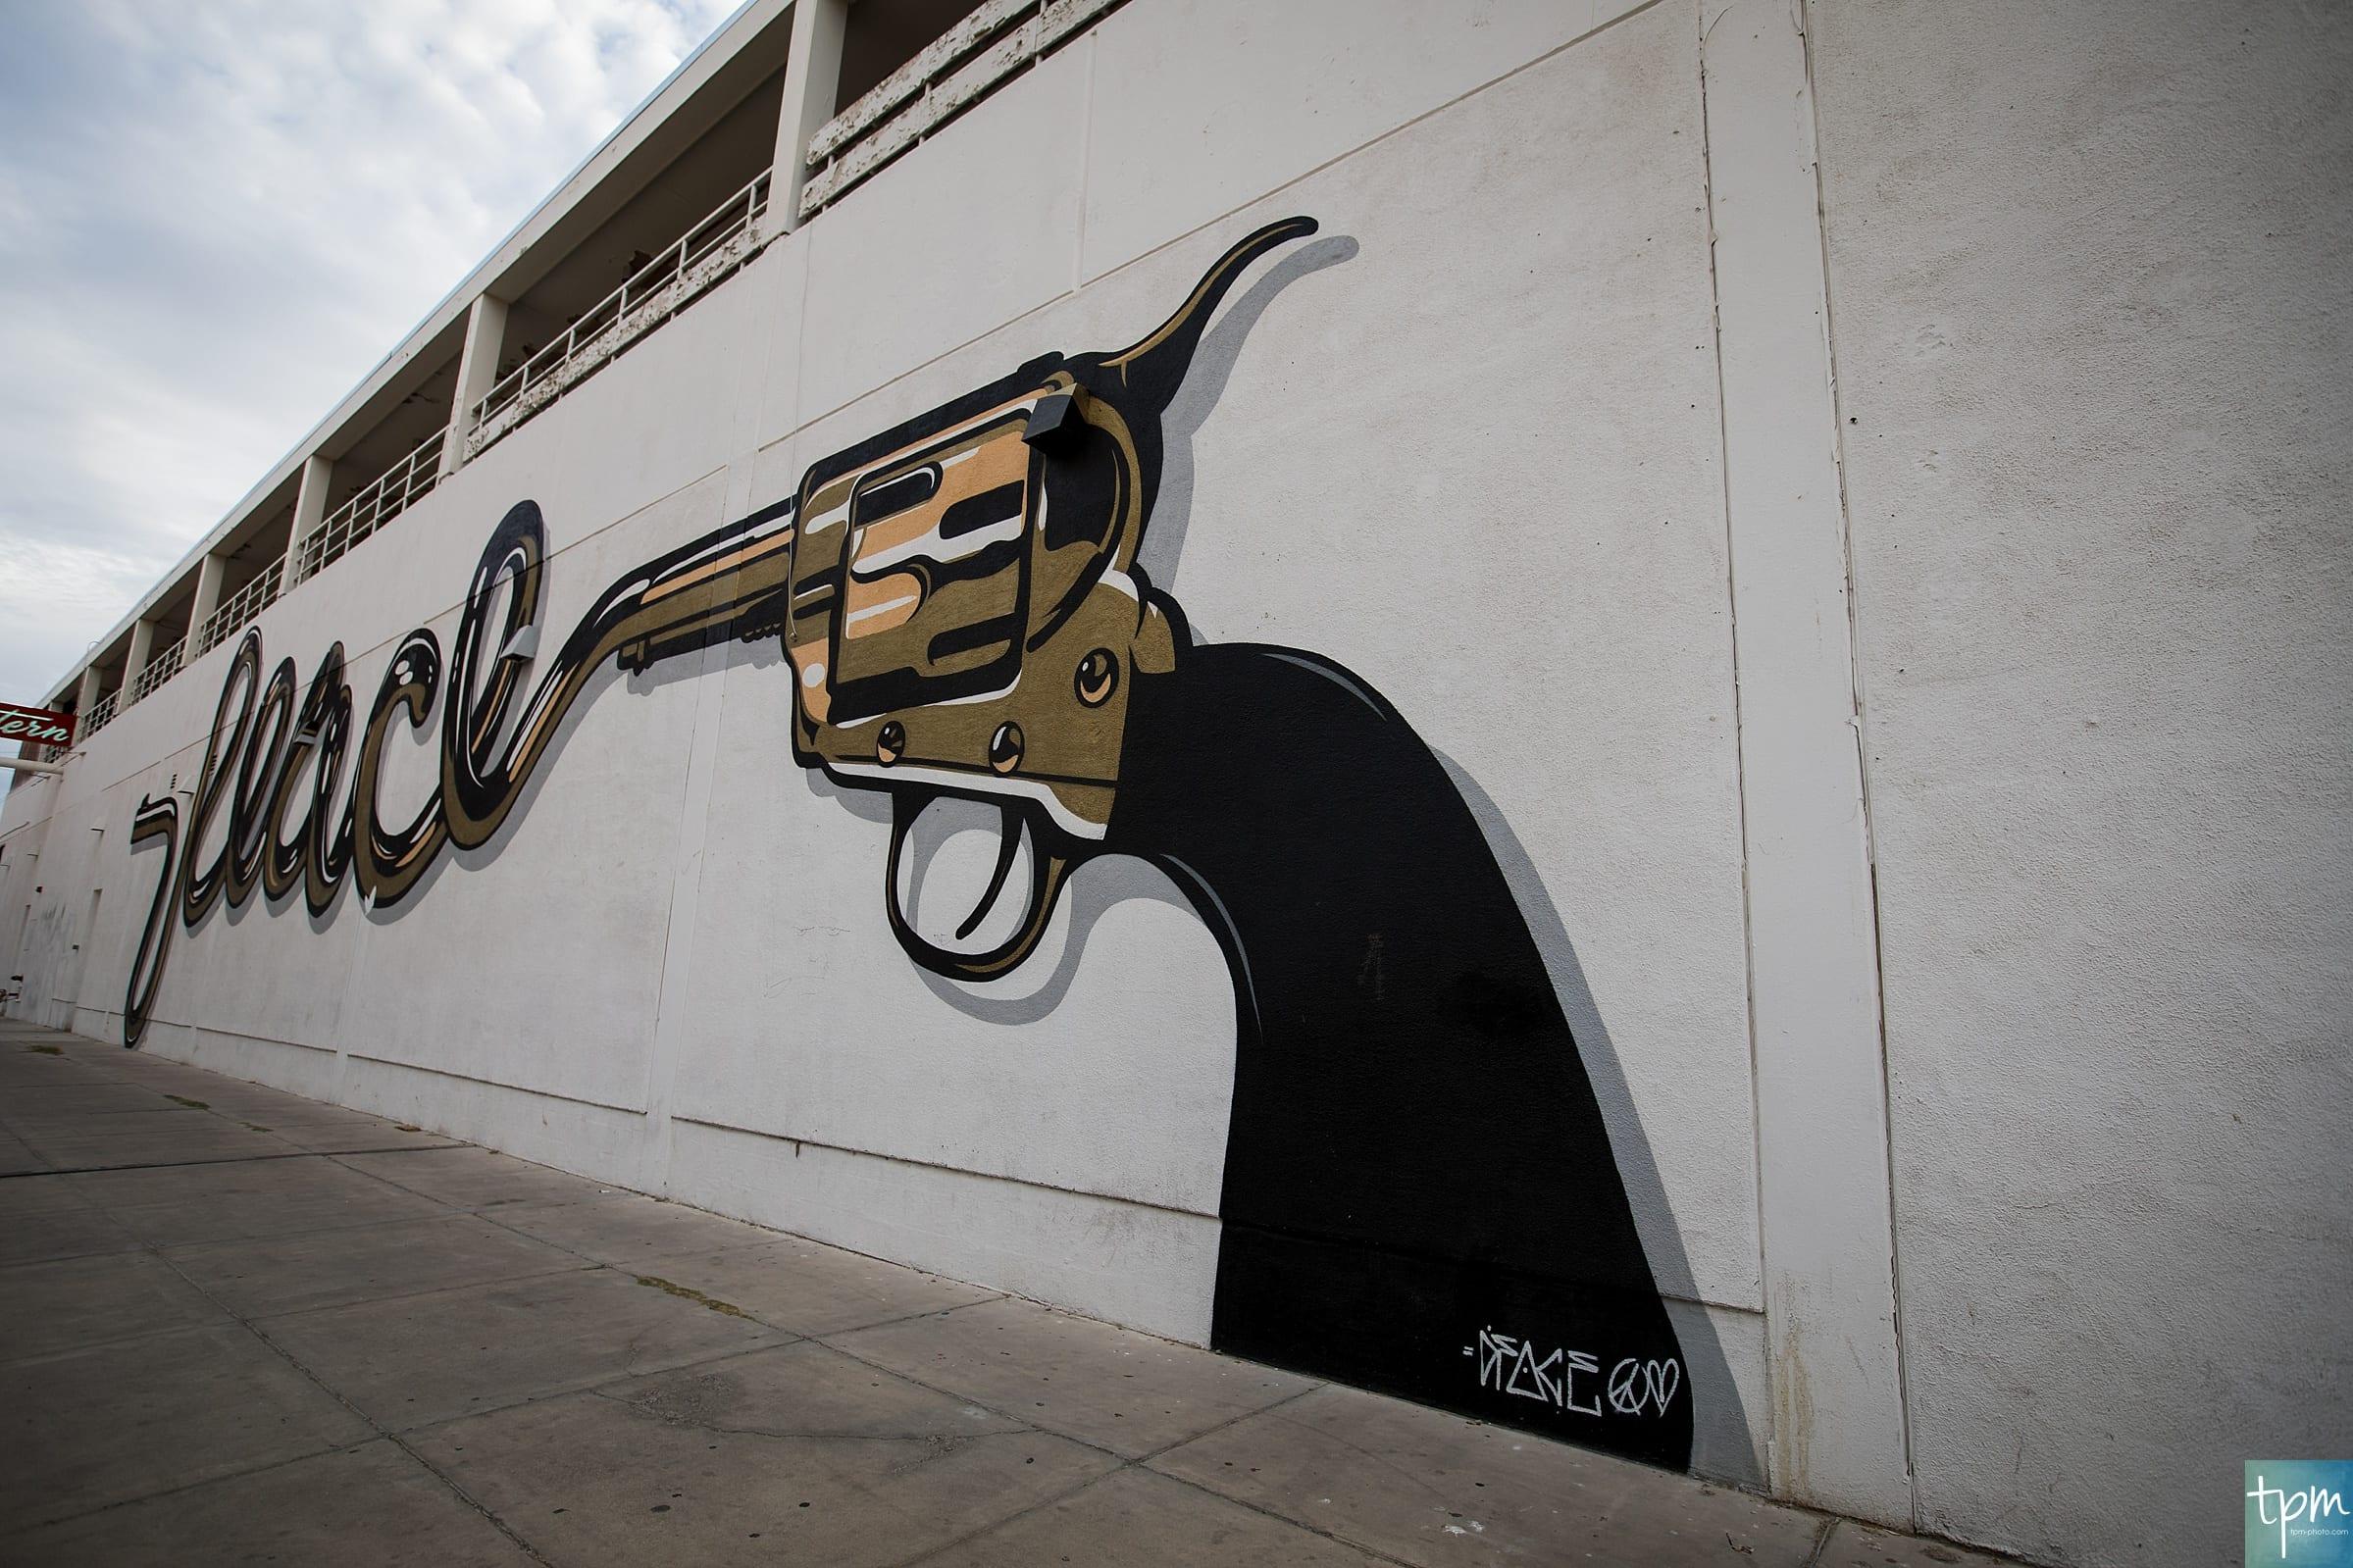 D*Face, Peacemaker, Taylored Photo Memories, Las Vegas Murals